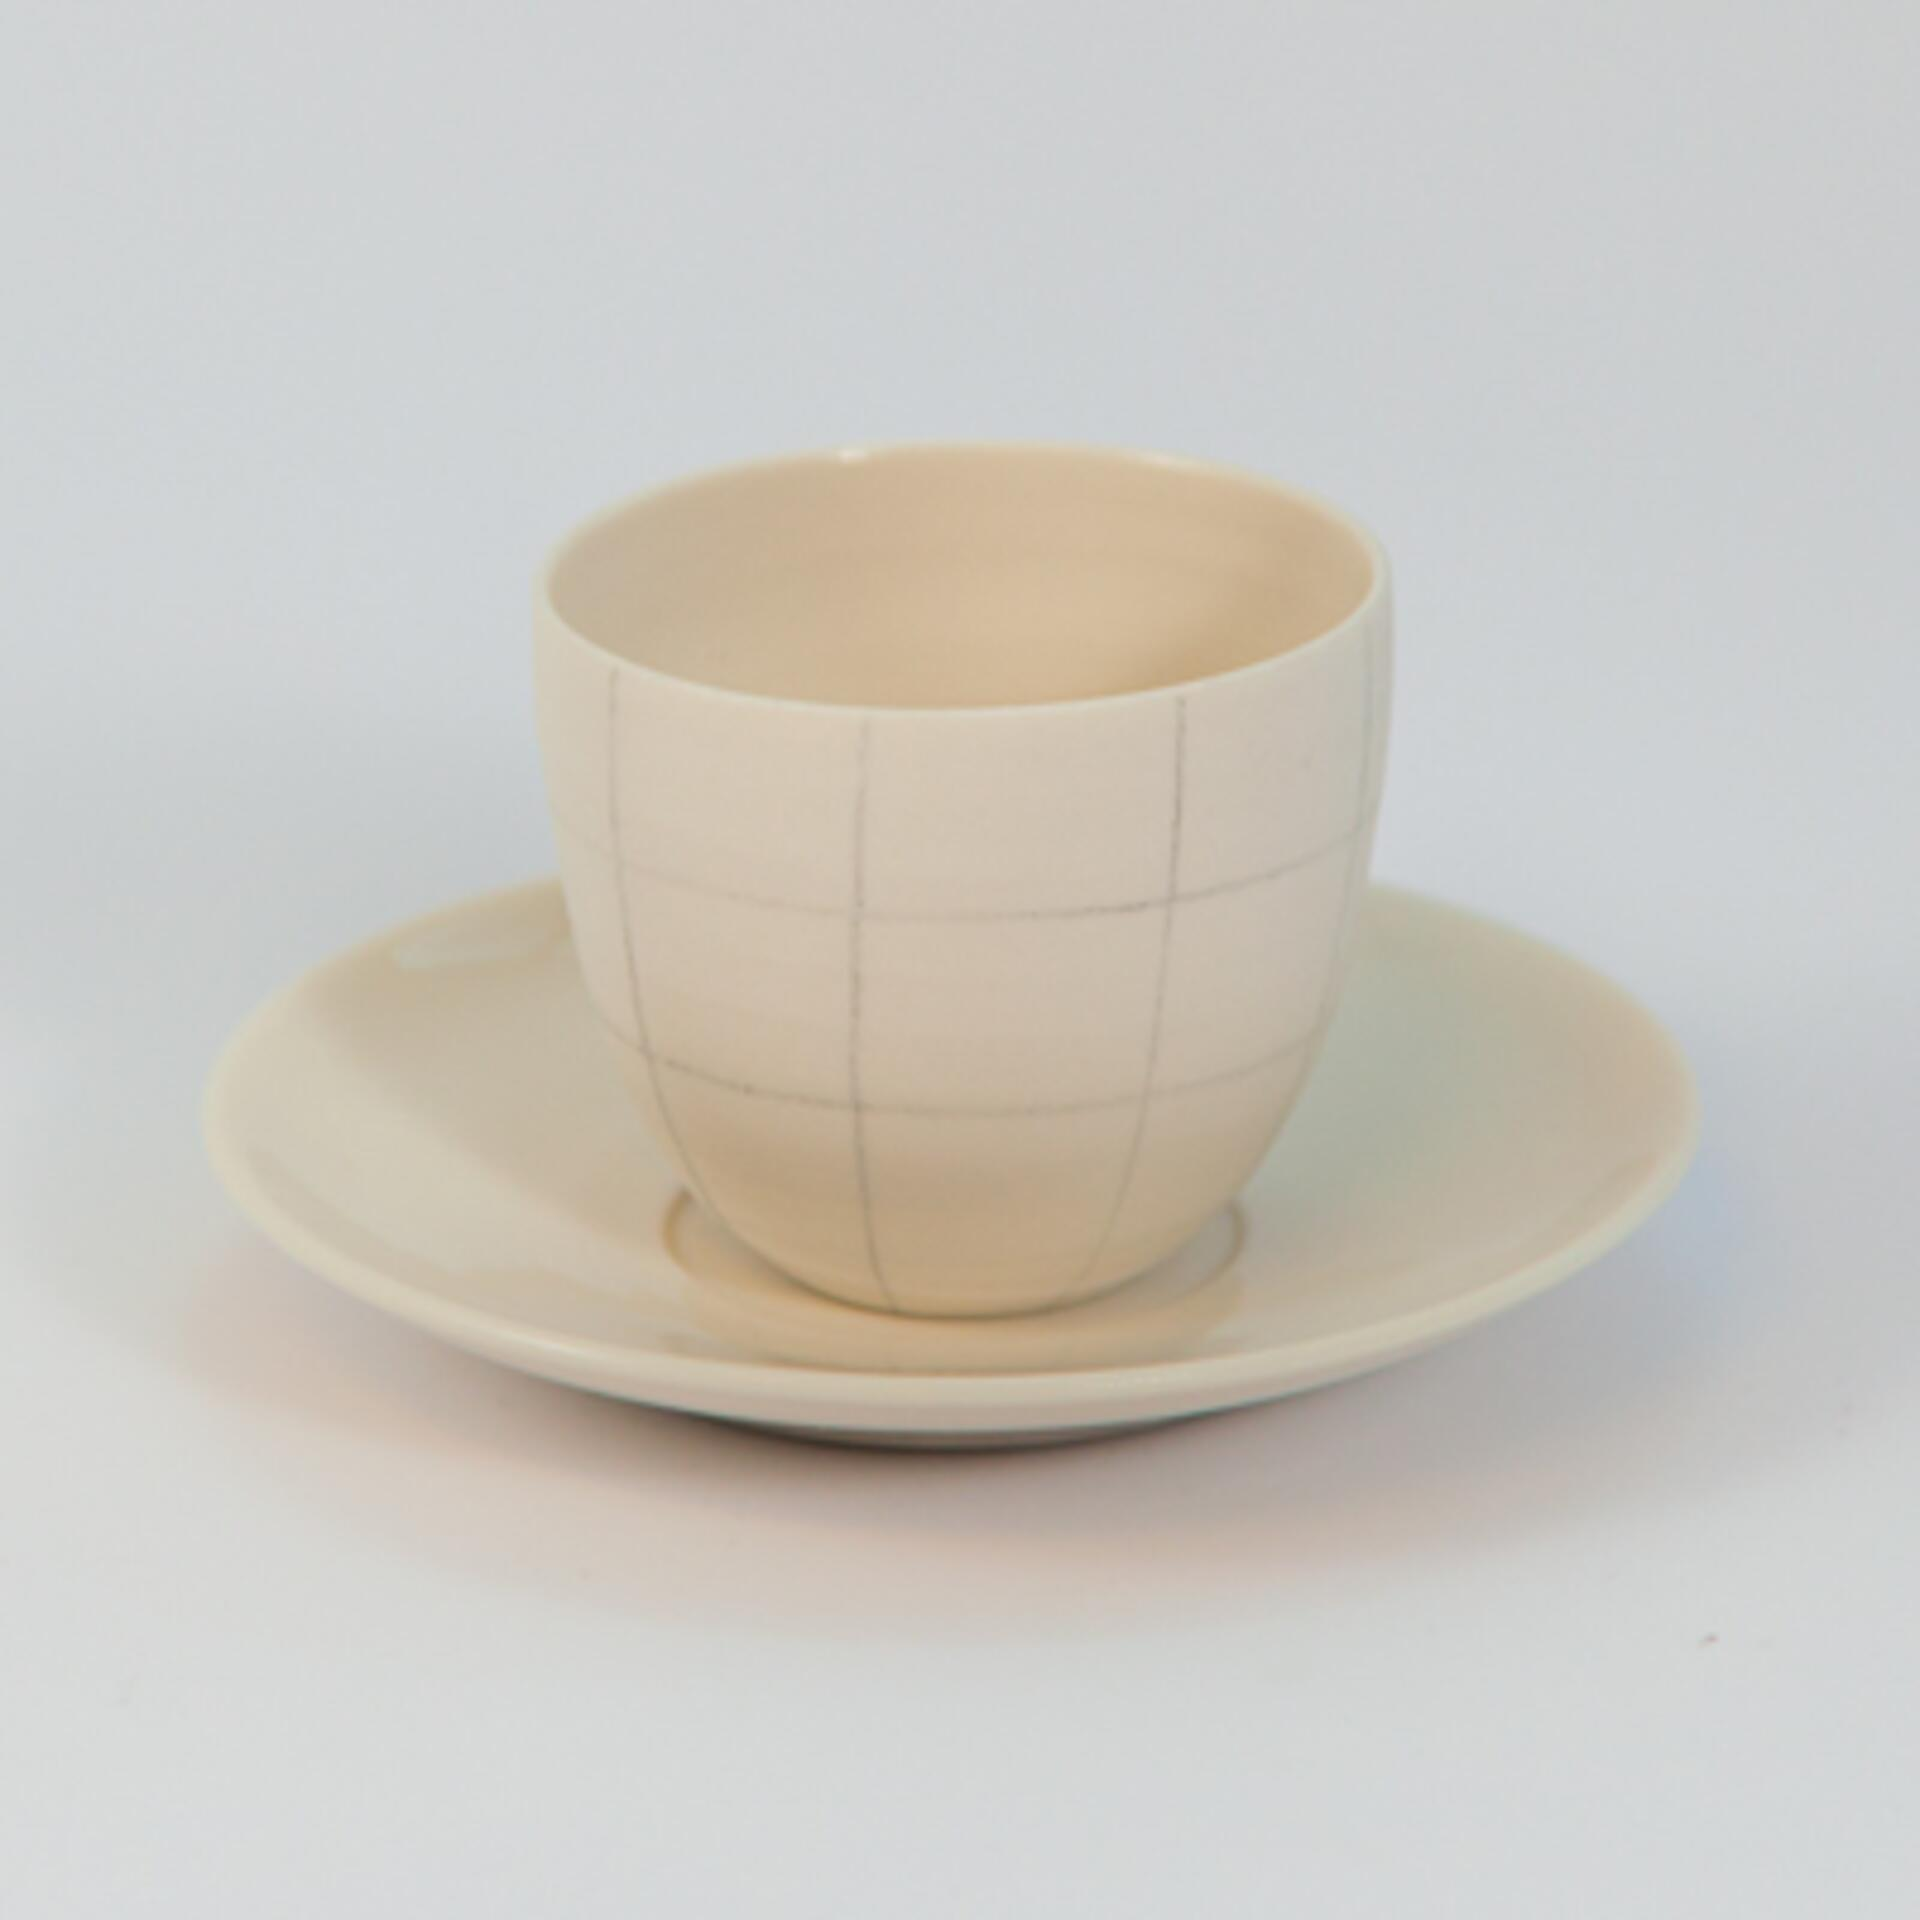 Schoemig Porzellan Espressotasse Graph Quadrat Groß